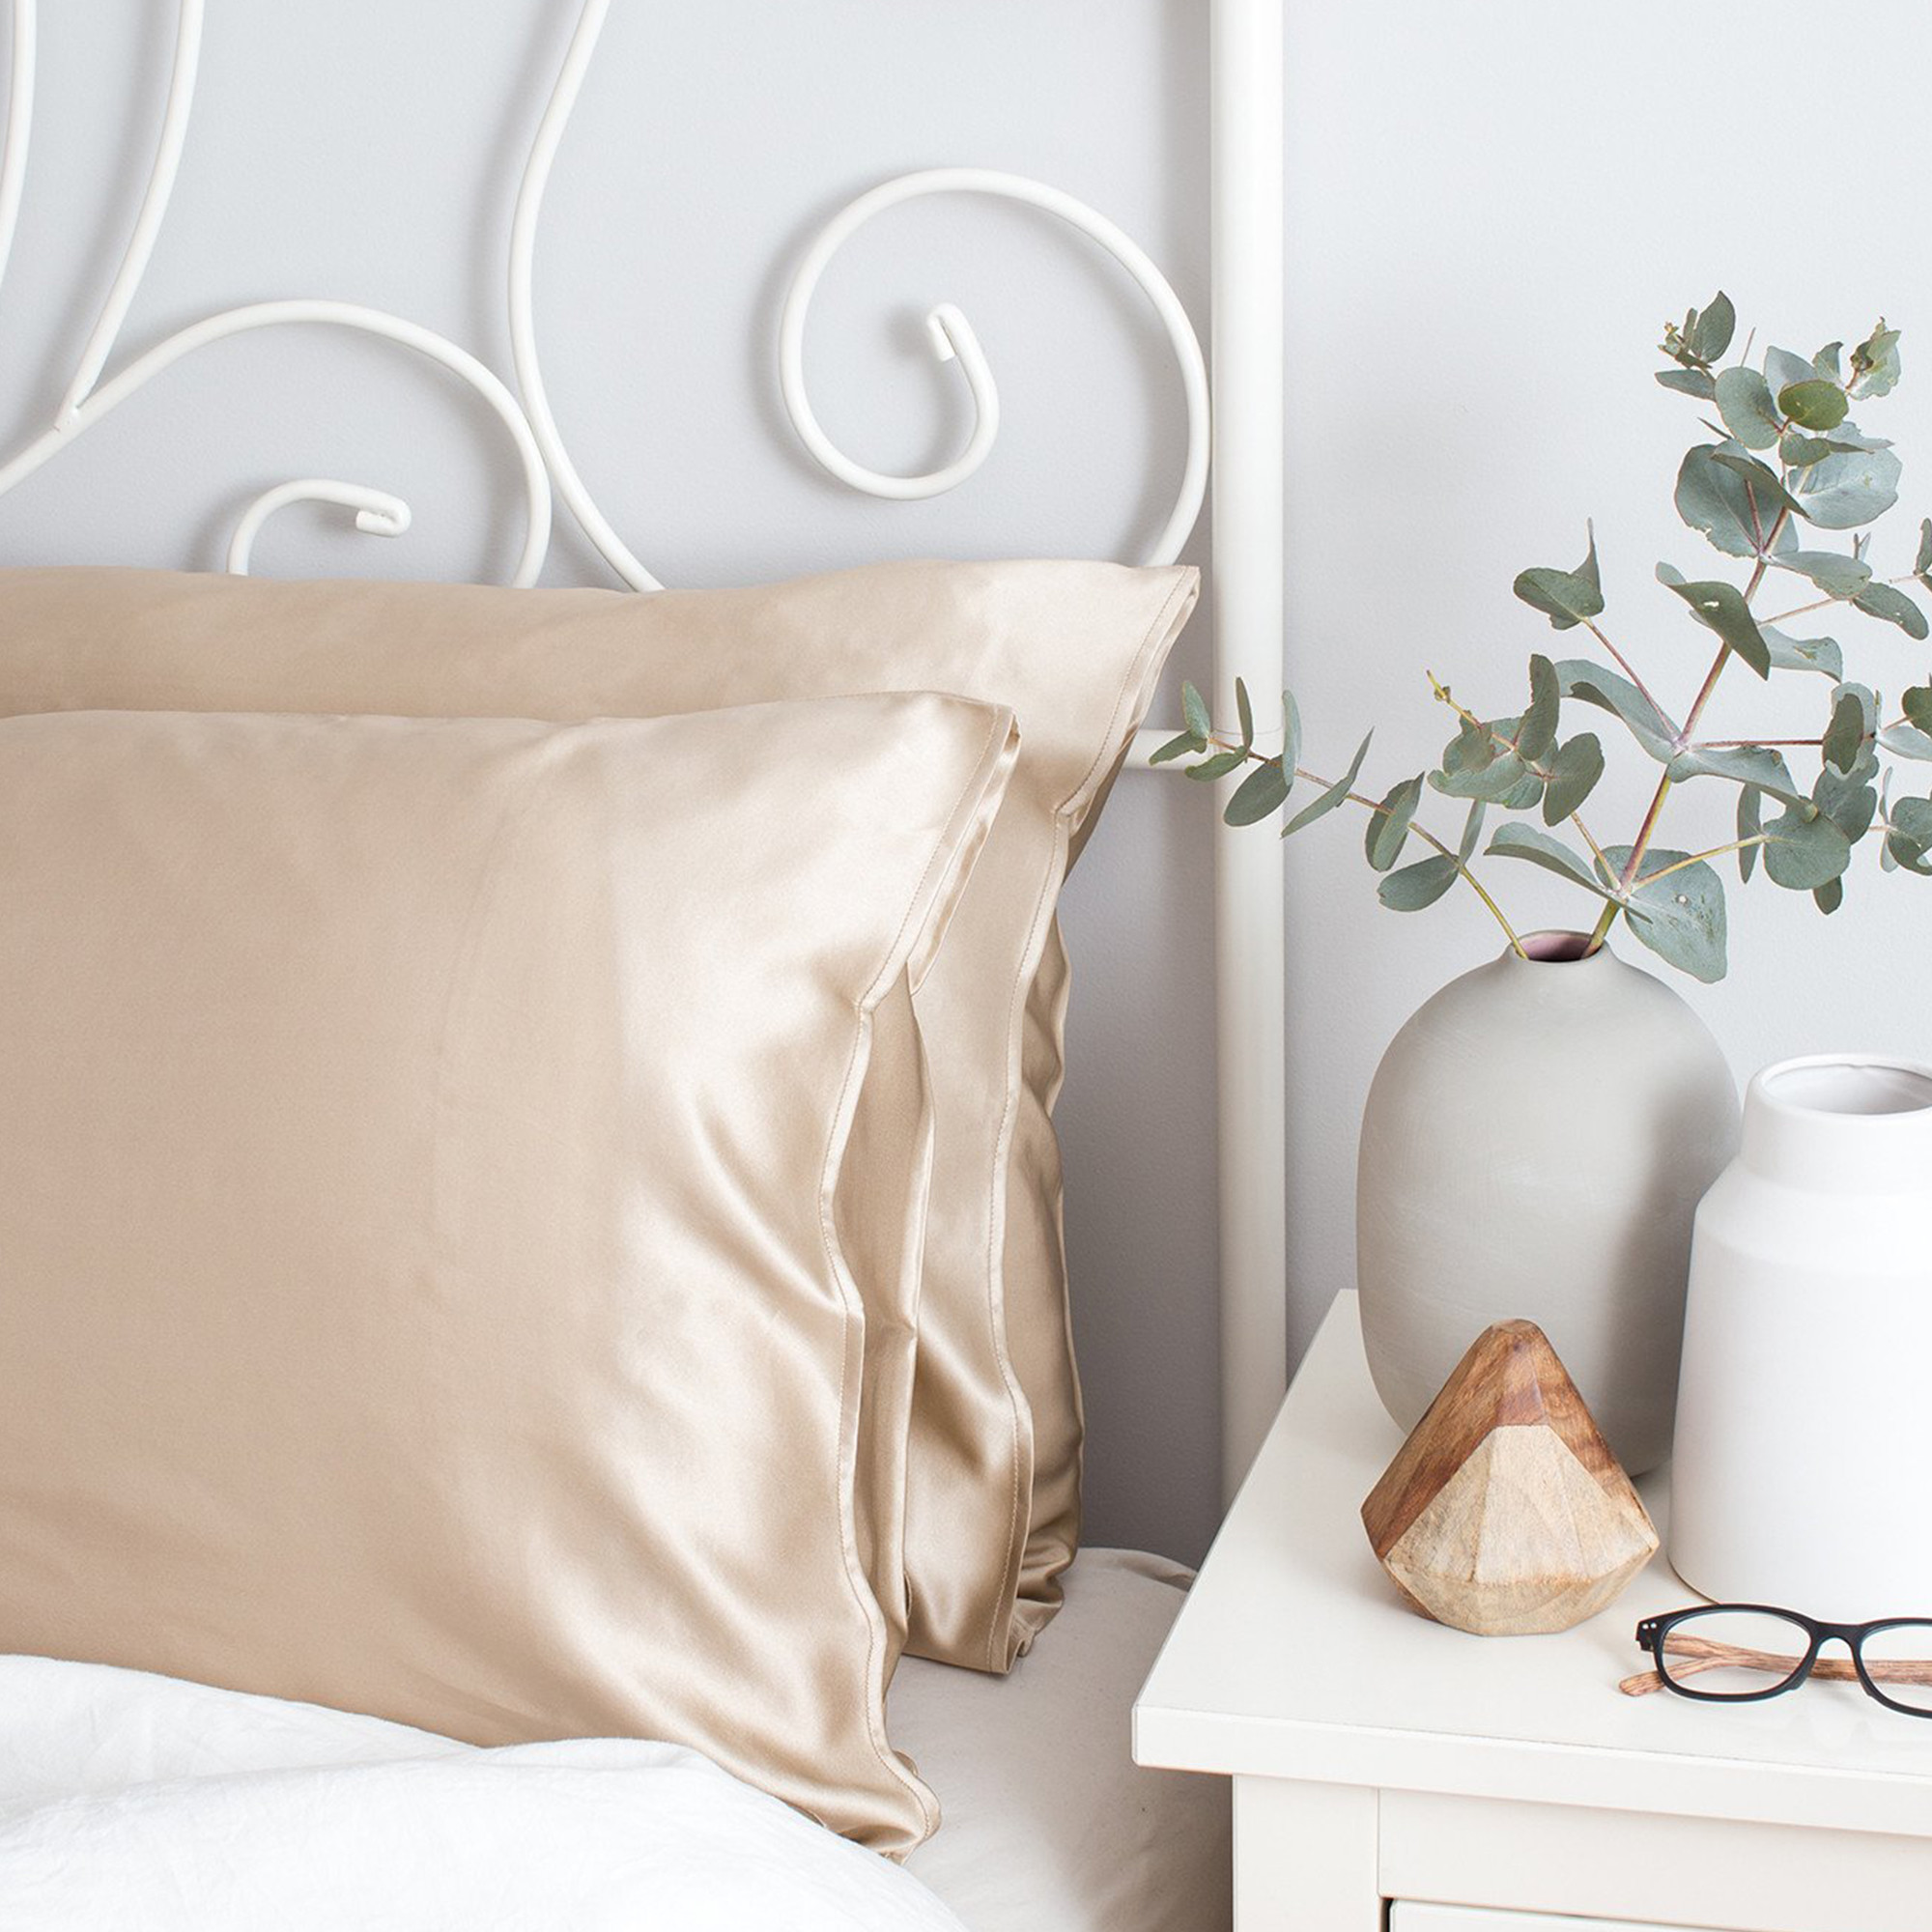 The Goodnight Co Silk Pillowcase